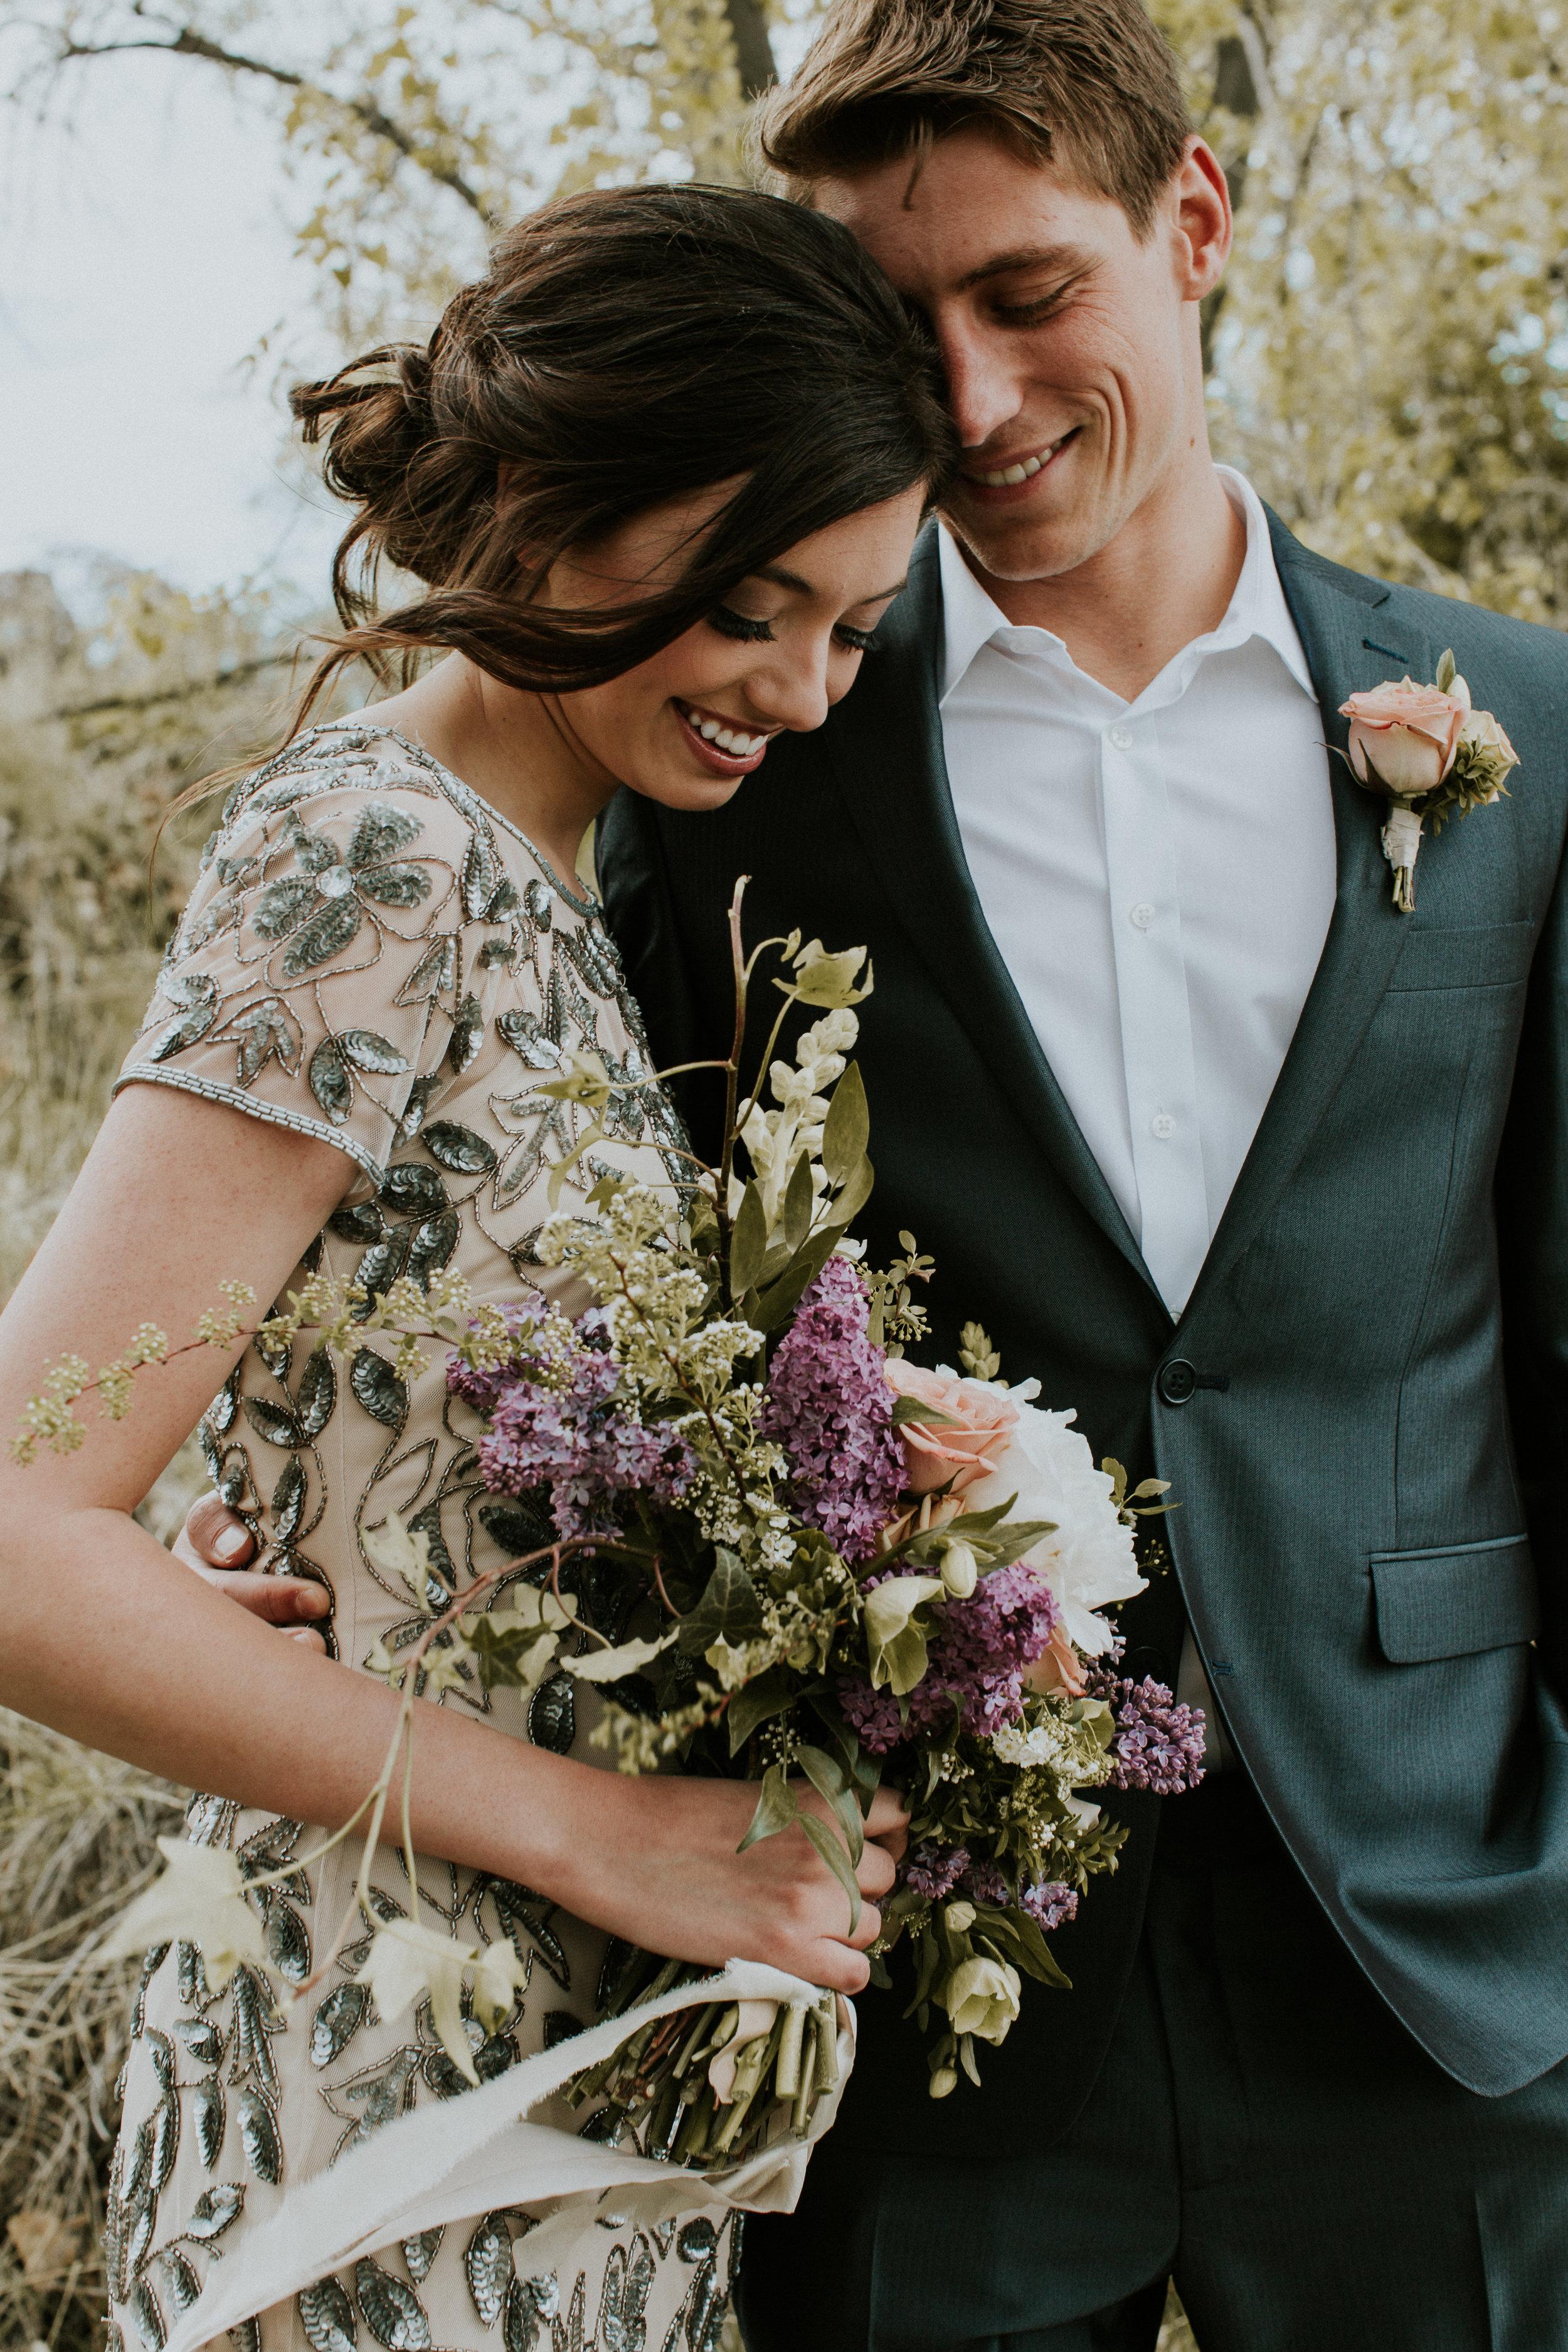 Denver-wedding-hairstylist-messy-loose-updo